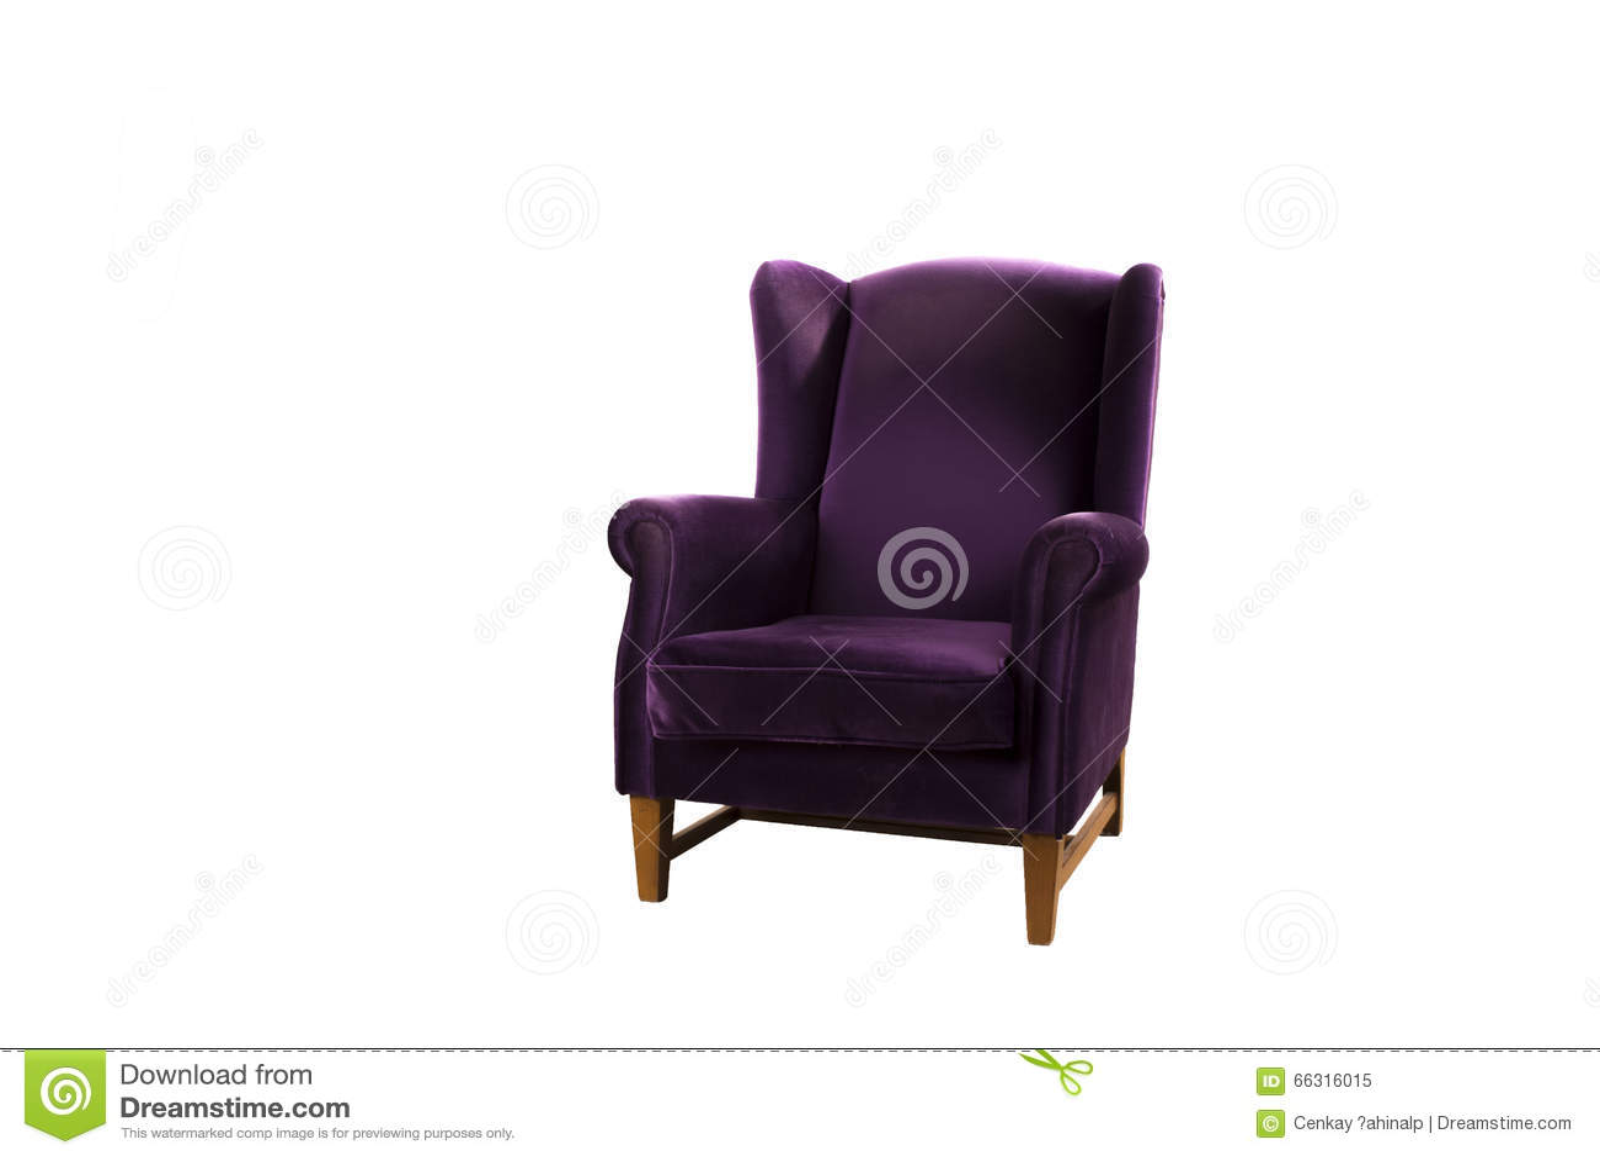 Download Purple Armchair Velvet Stock Image. Image Of Style, Studio    66316015